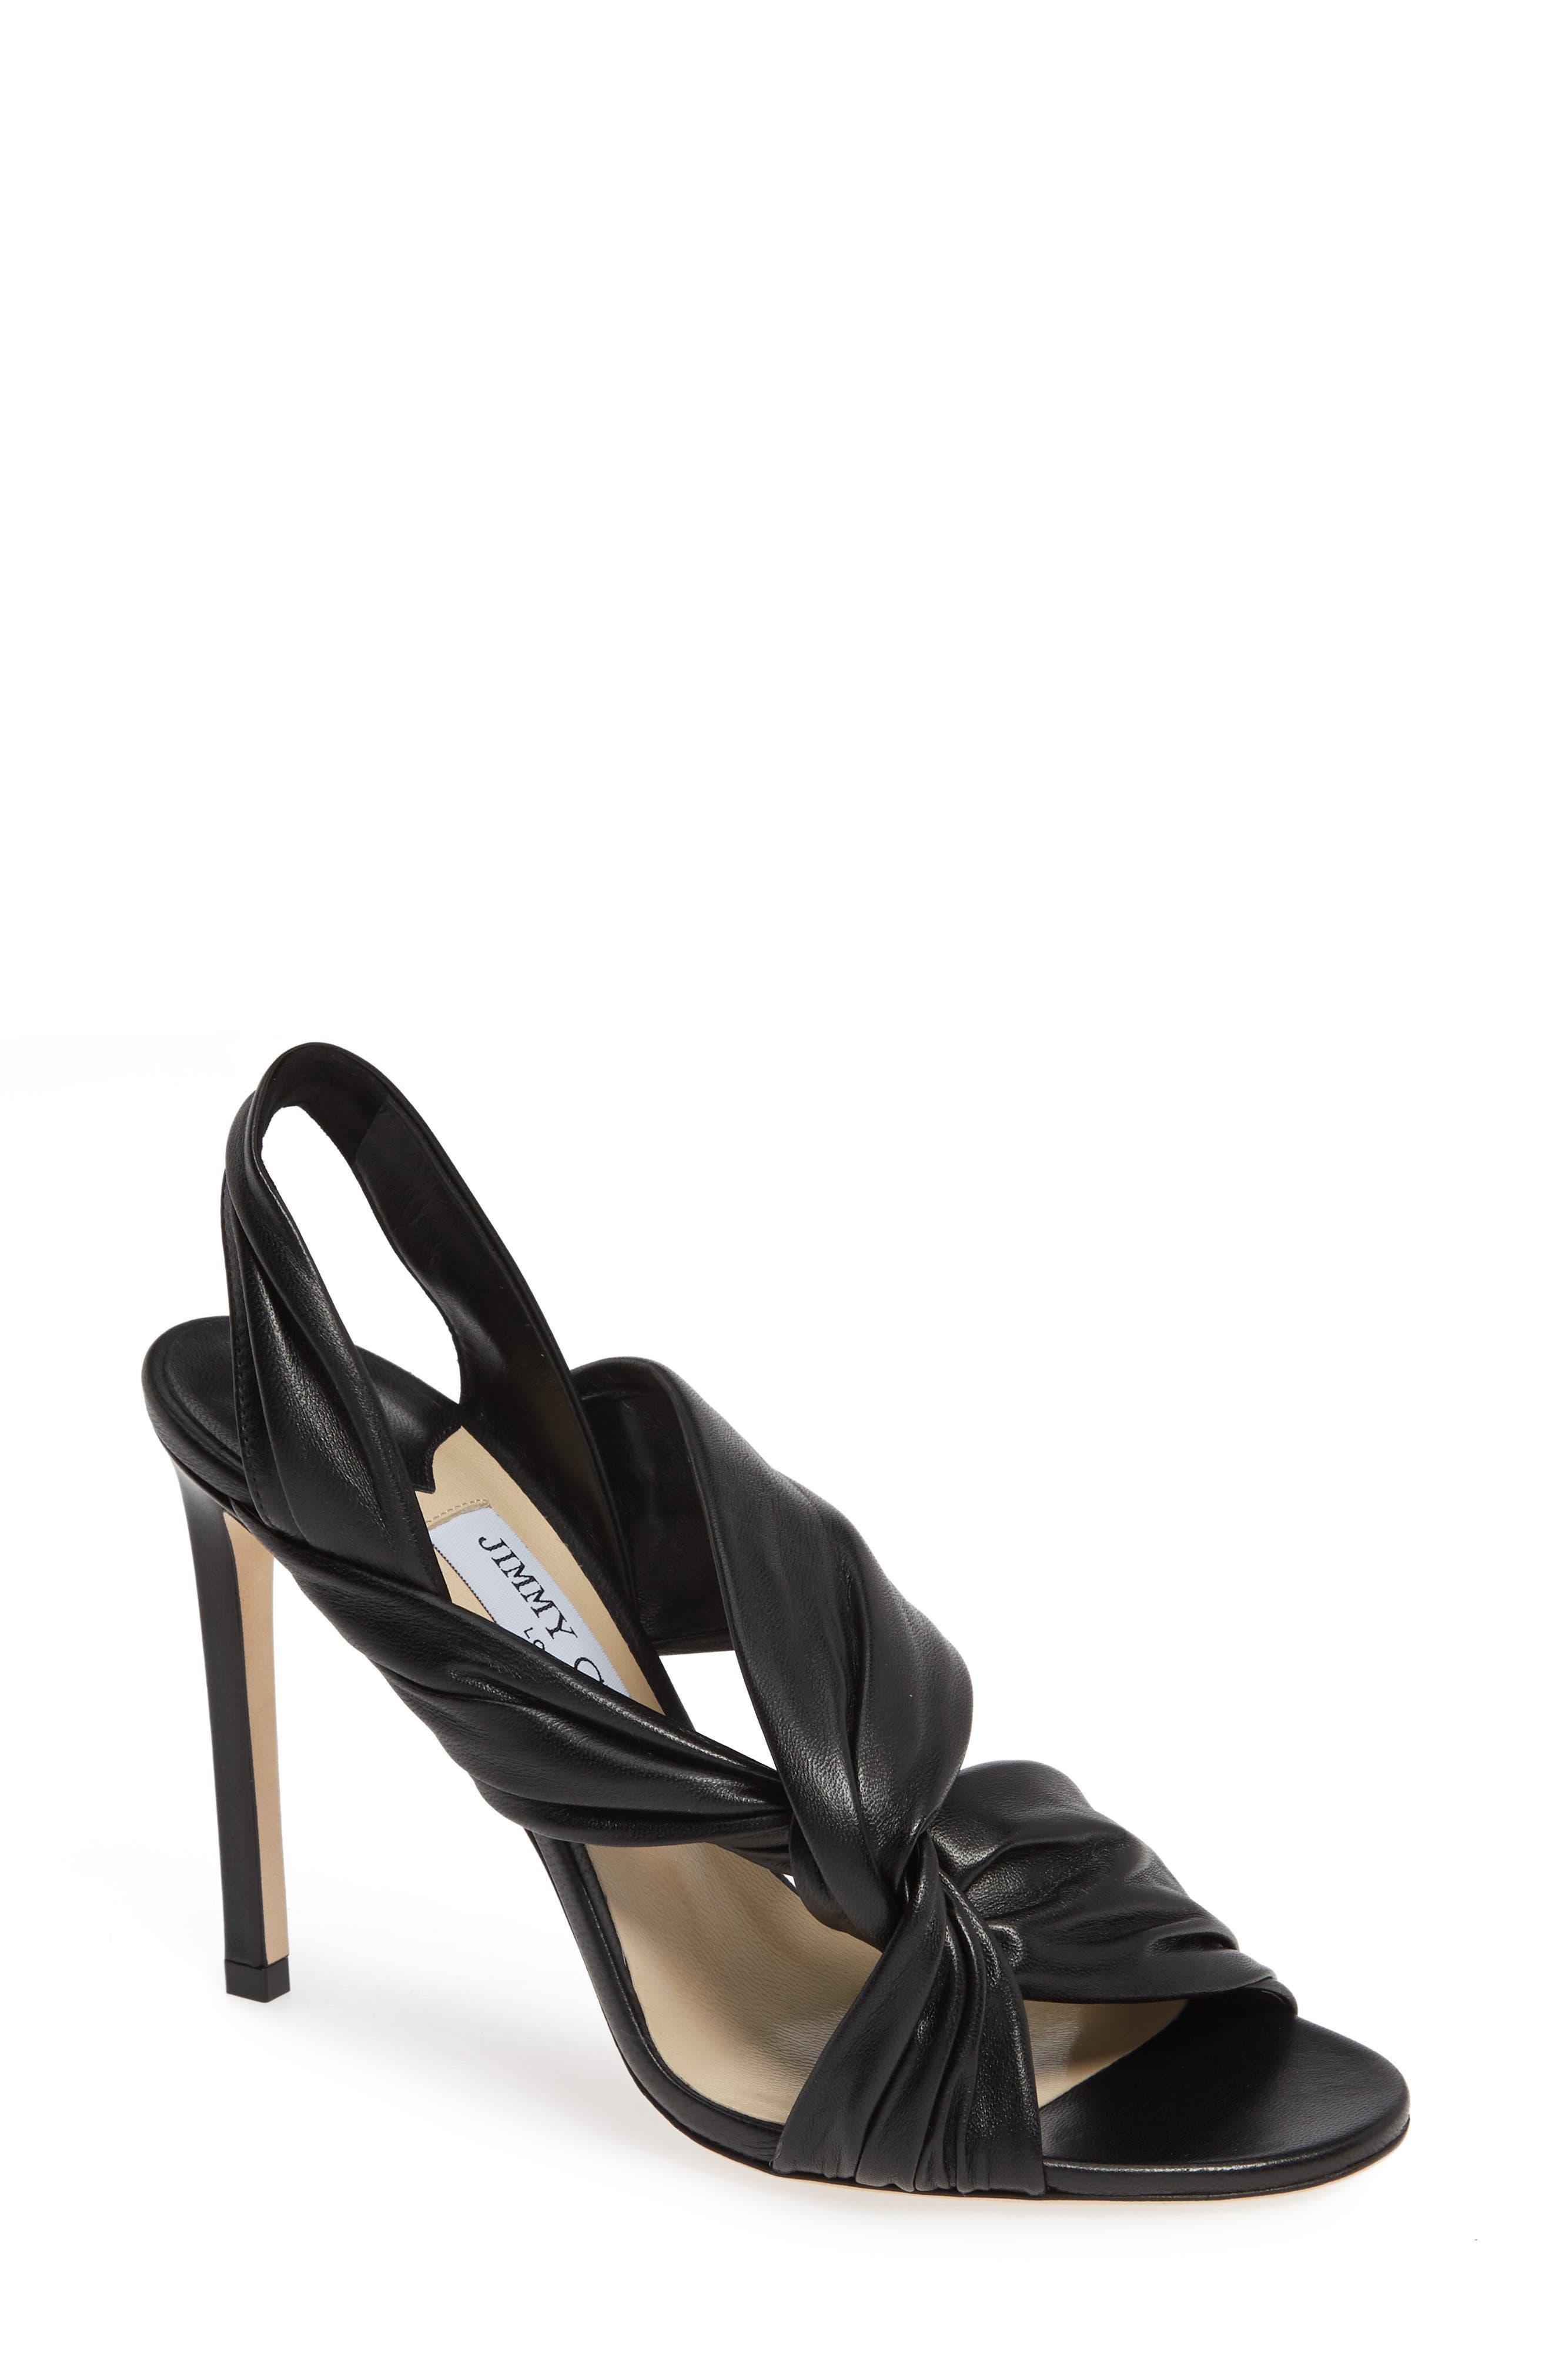 Lalia Slingback Sandal,                             Main thumbnail 1, color,                             BLACK